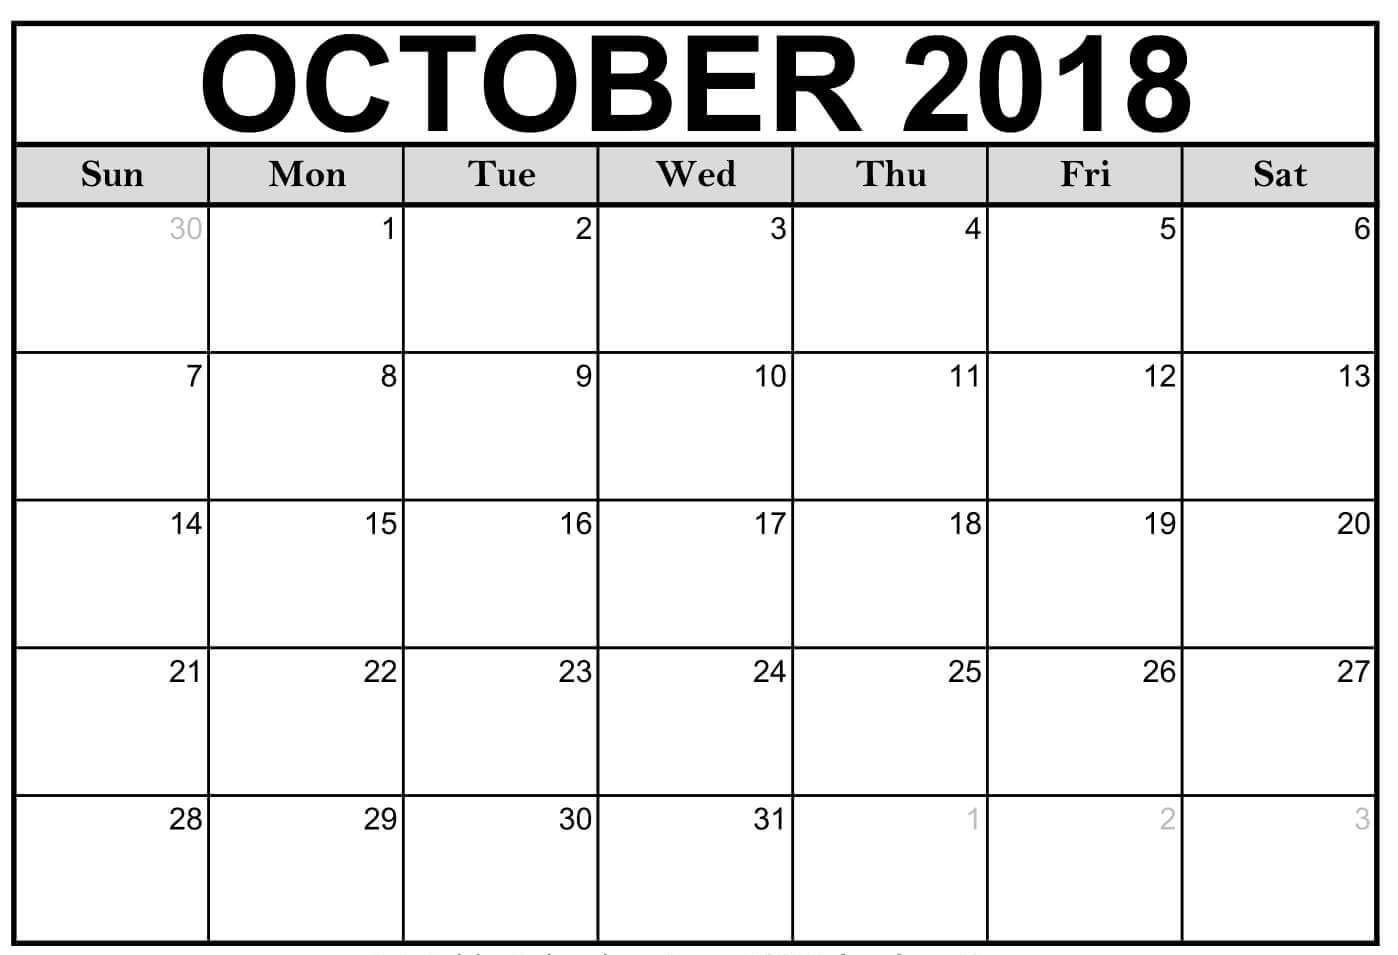 Printable 2018 October Calendar Blank Templates With Holidays